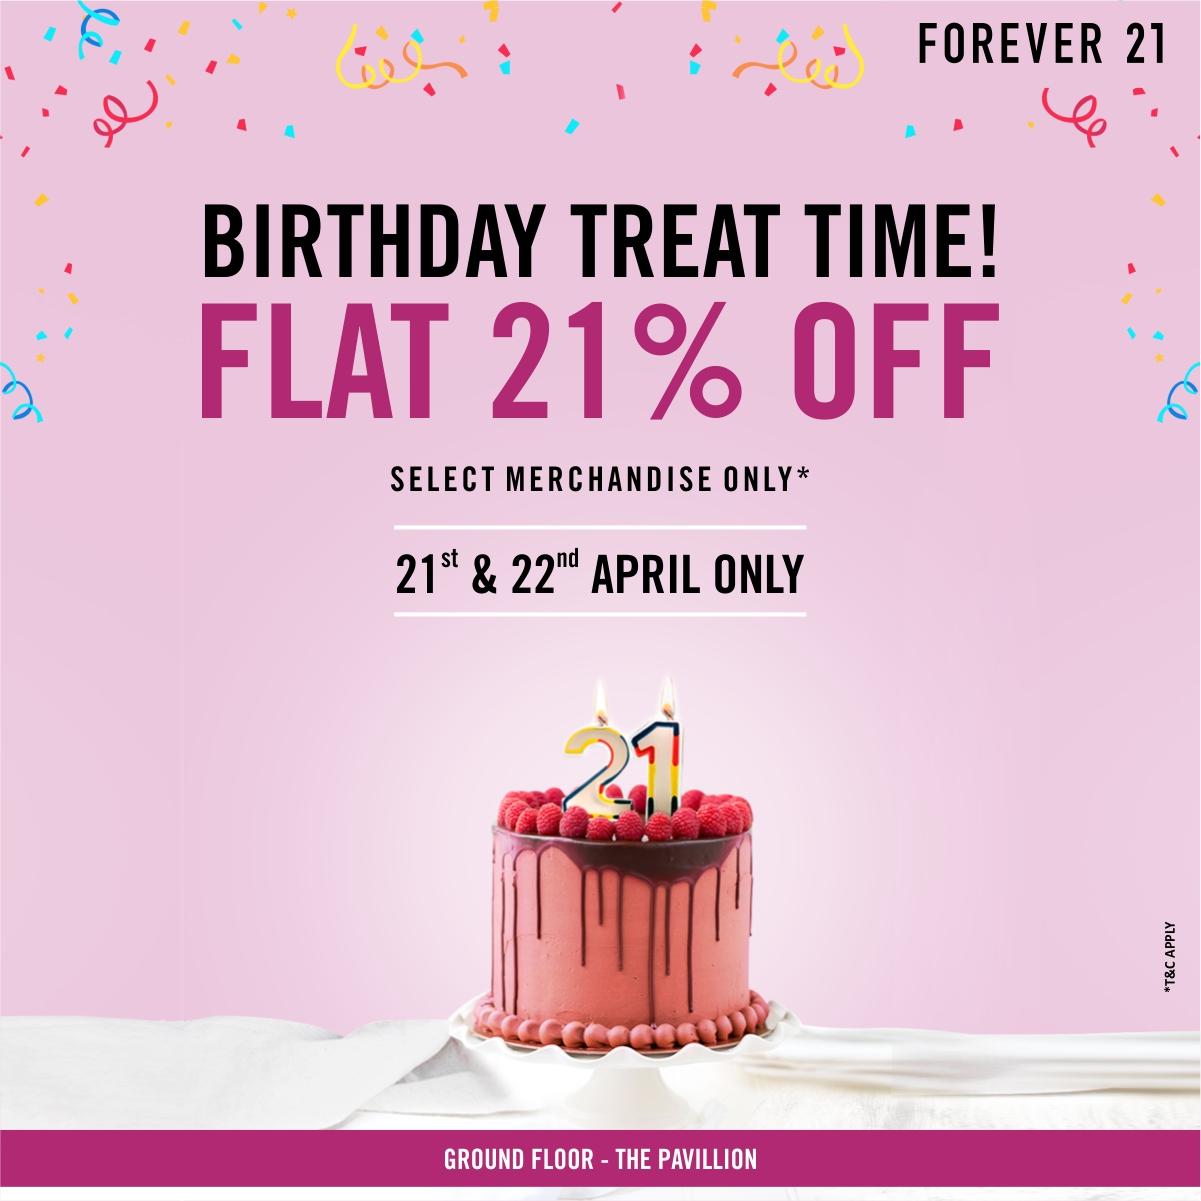 Forever 21 birthday